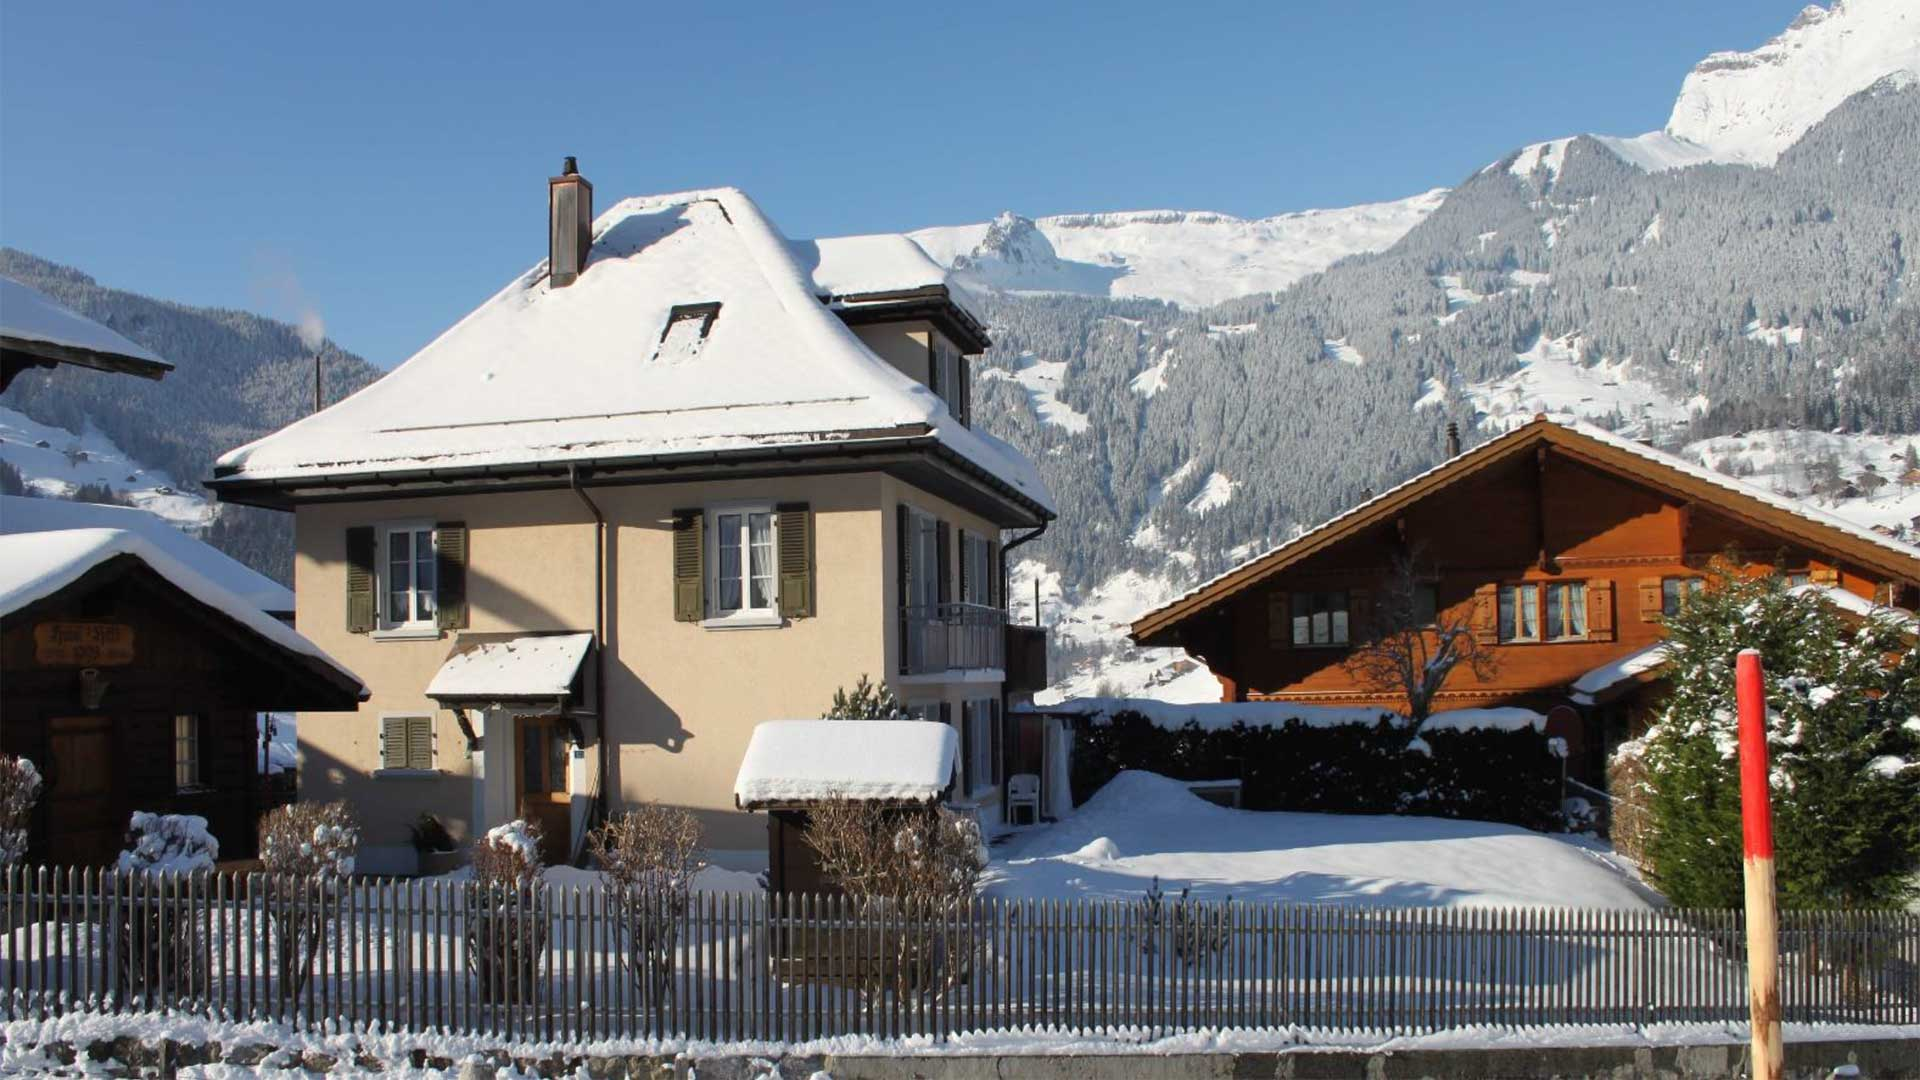 Chalet Holzweg Chalet, Switzerland